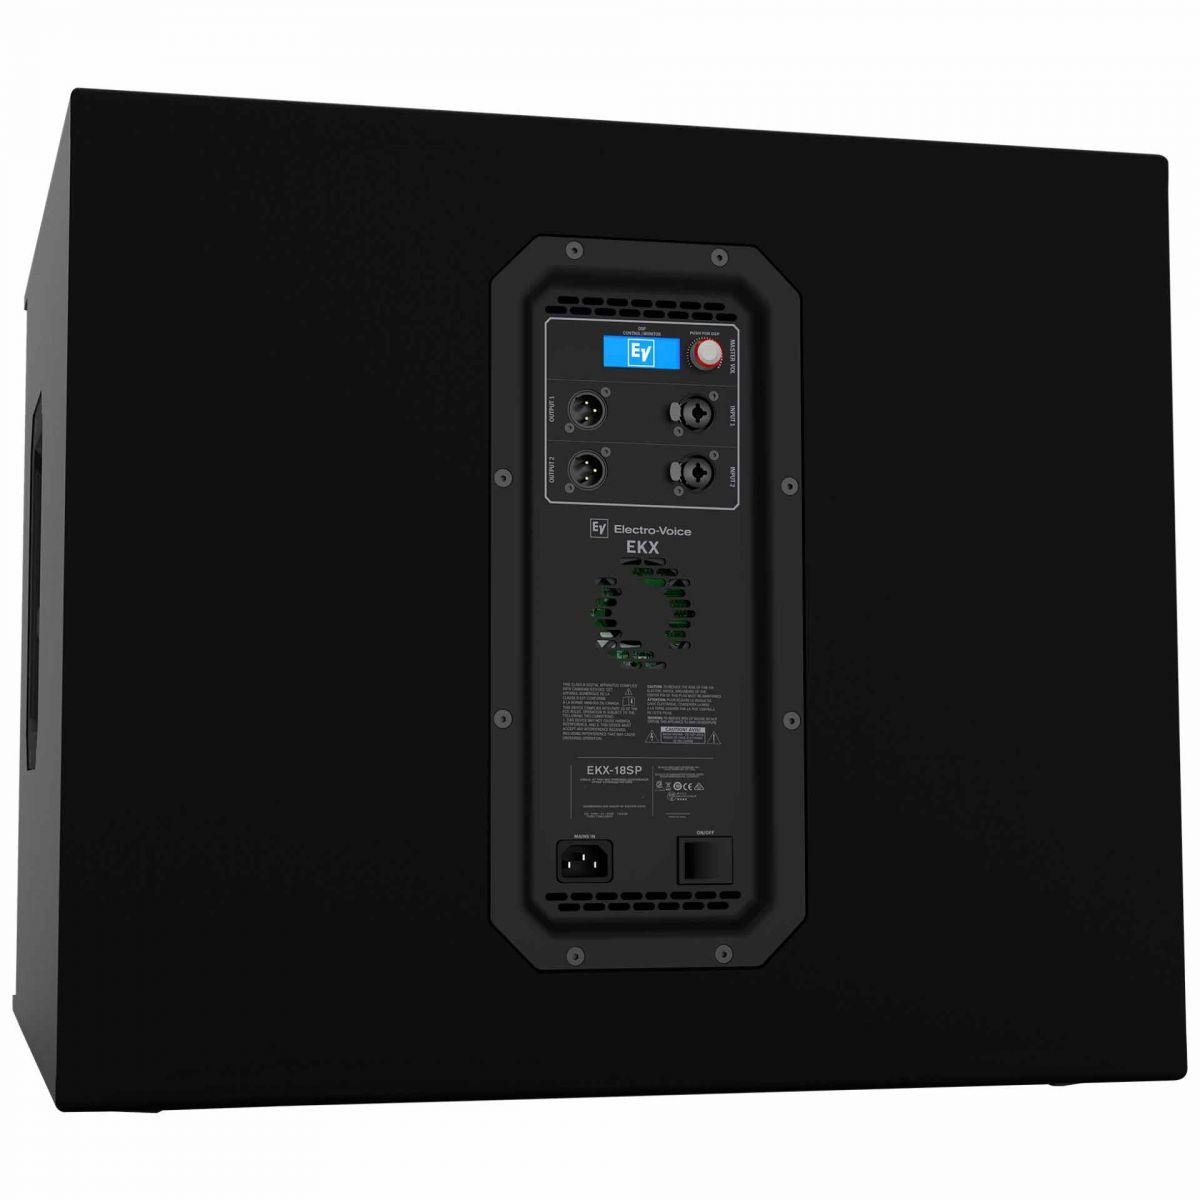 EKX18SPUS - Subwoofer Ativo 1300W EKX 18SP US - Electro-Voice